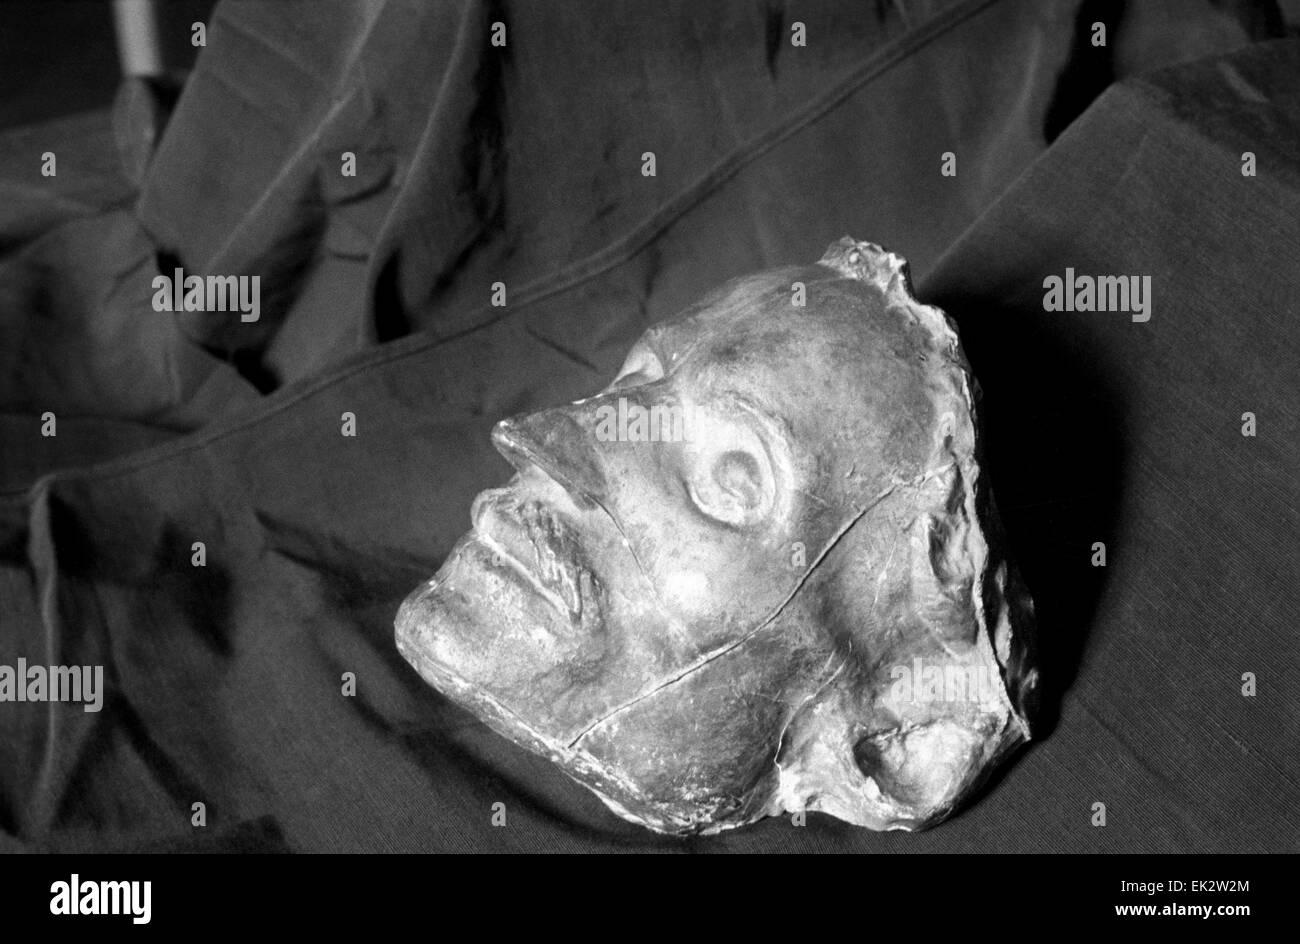 Moscow. The death mask of Nikolai Gogol is a work of sculptor Nikolai Ramazanov - Stock Image